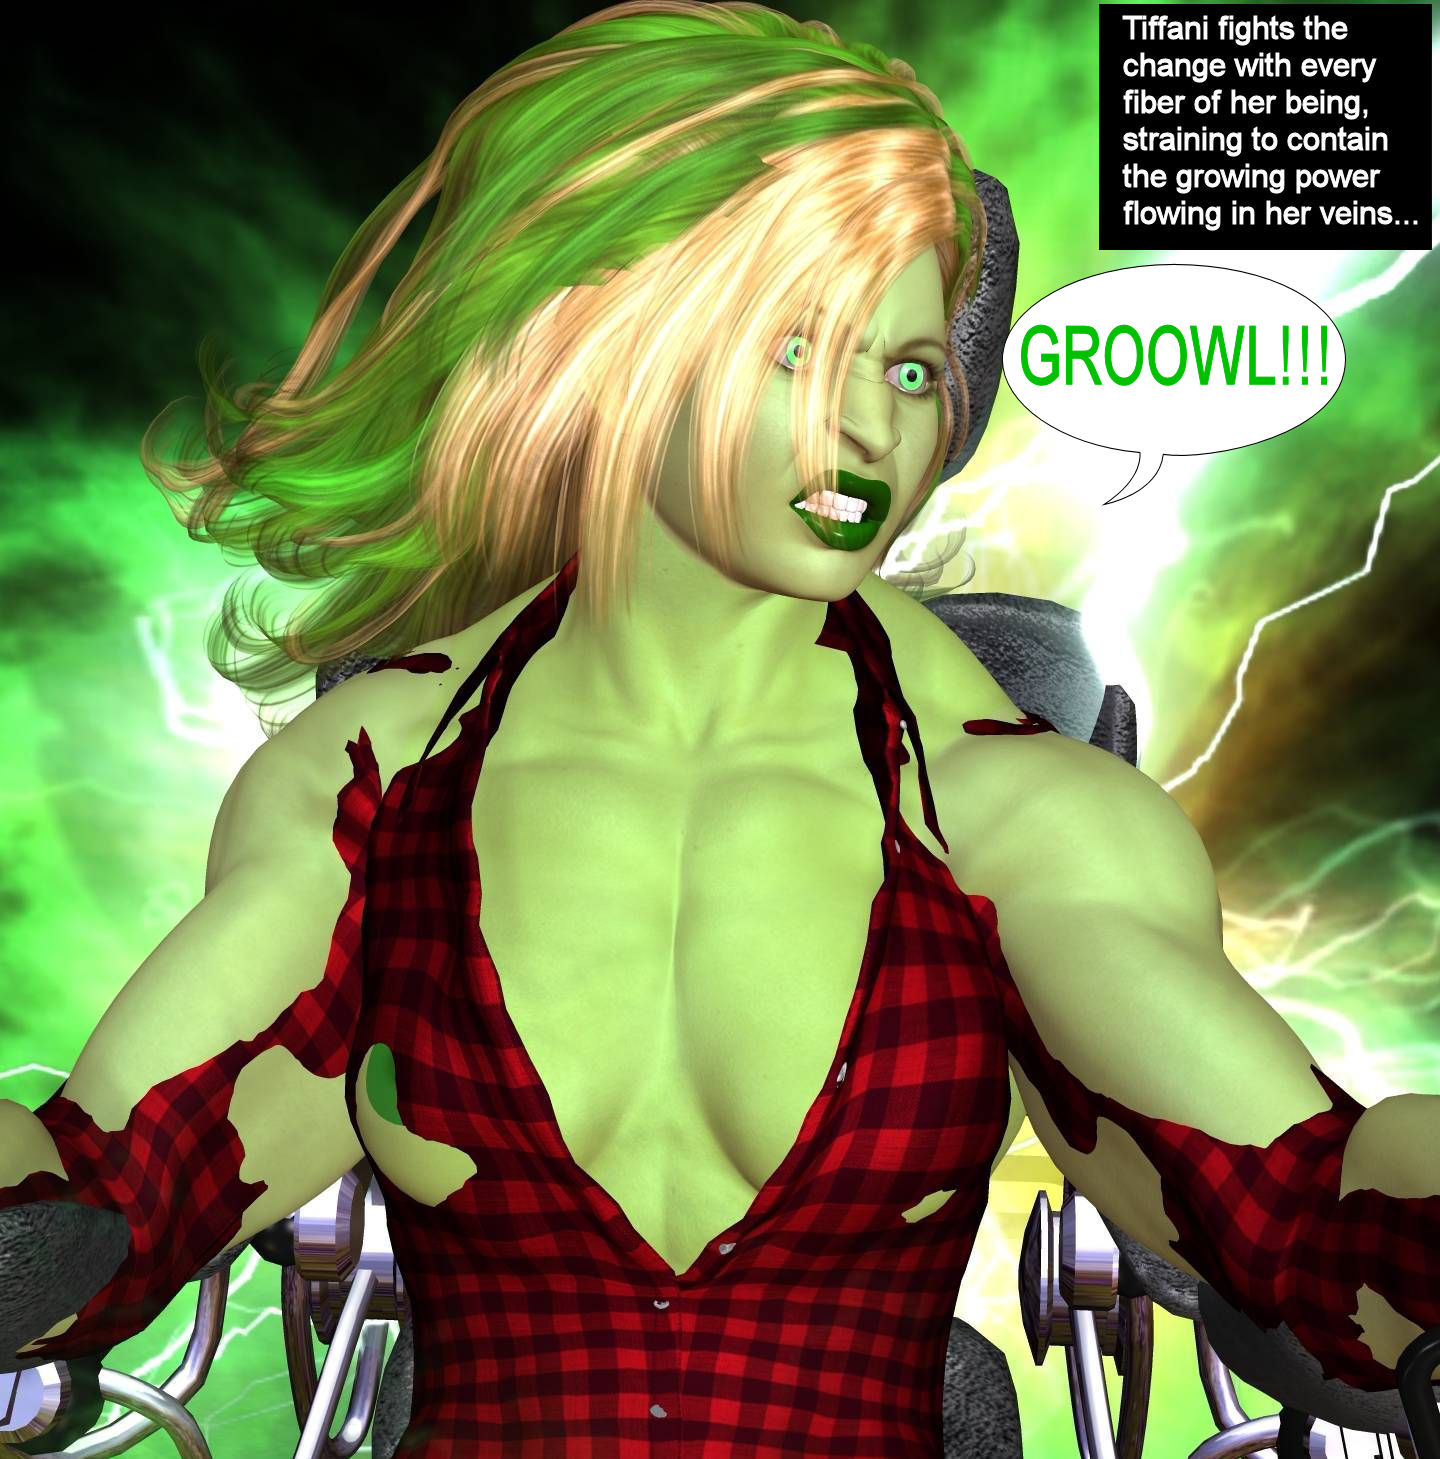 Tiffani Becomes She-Hulk 19k By Mercblue22 On DeviantArt